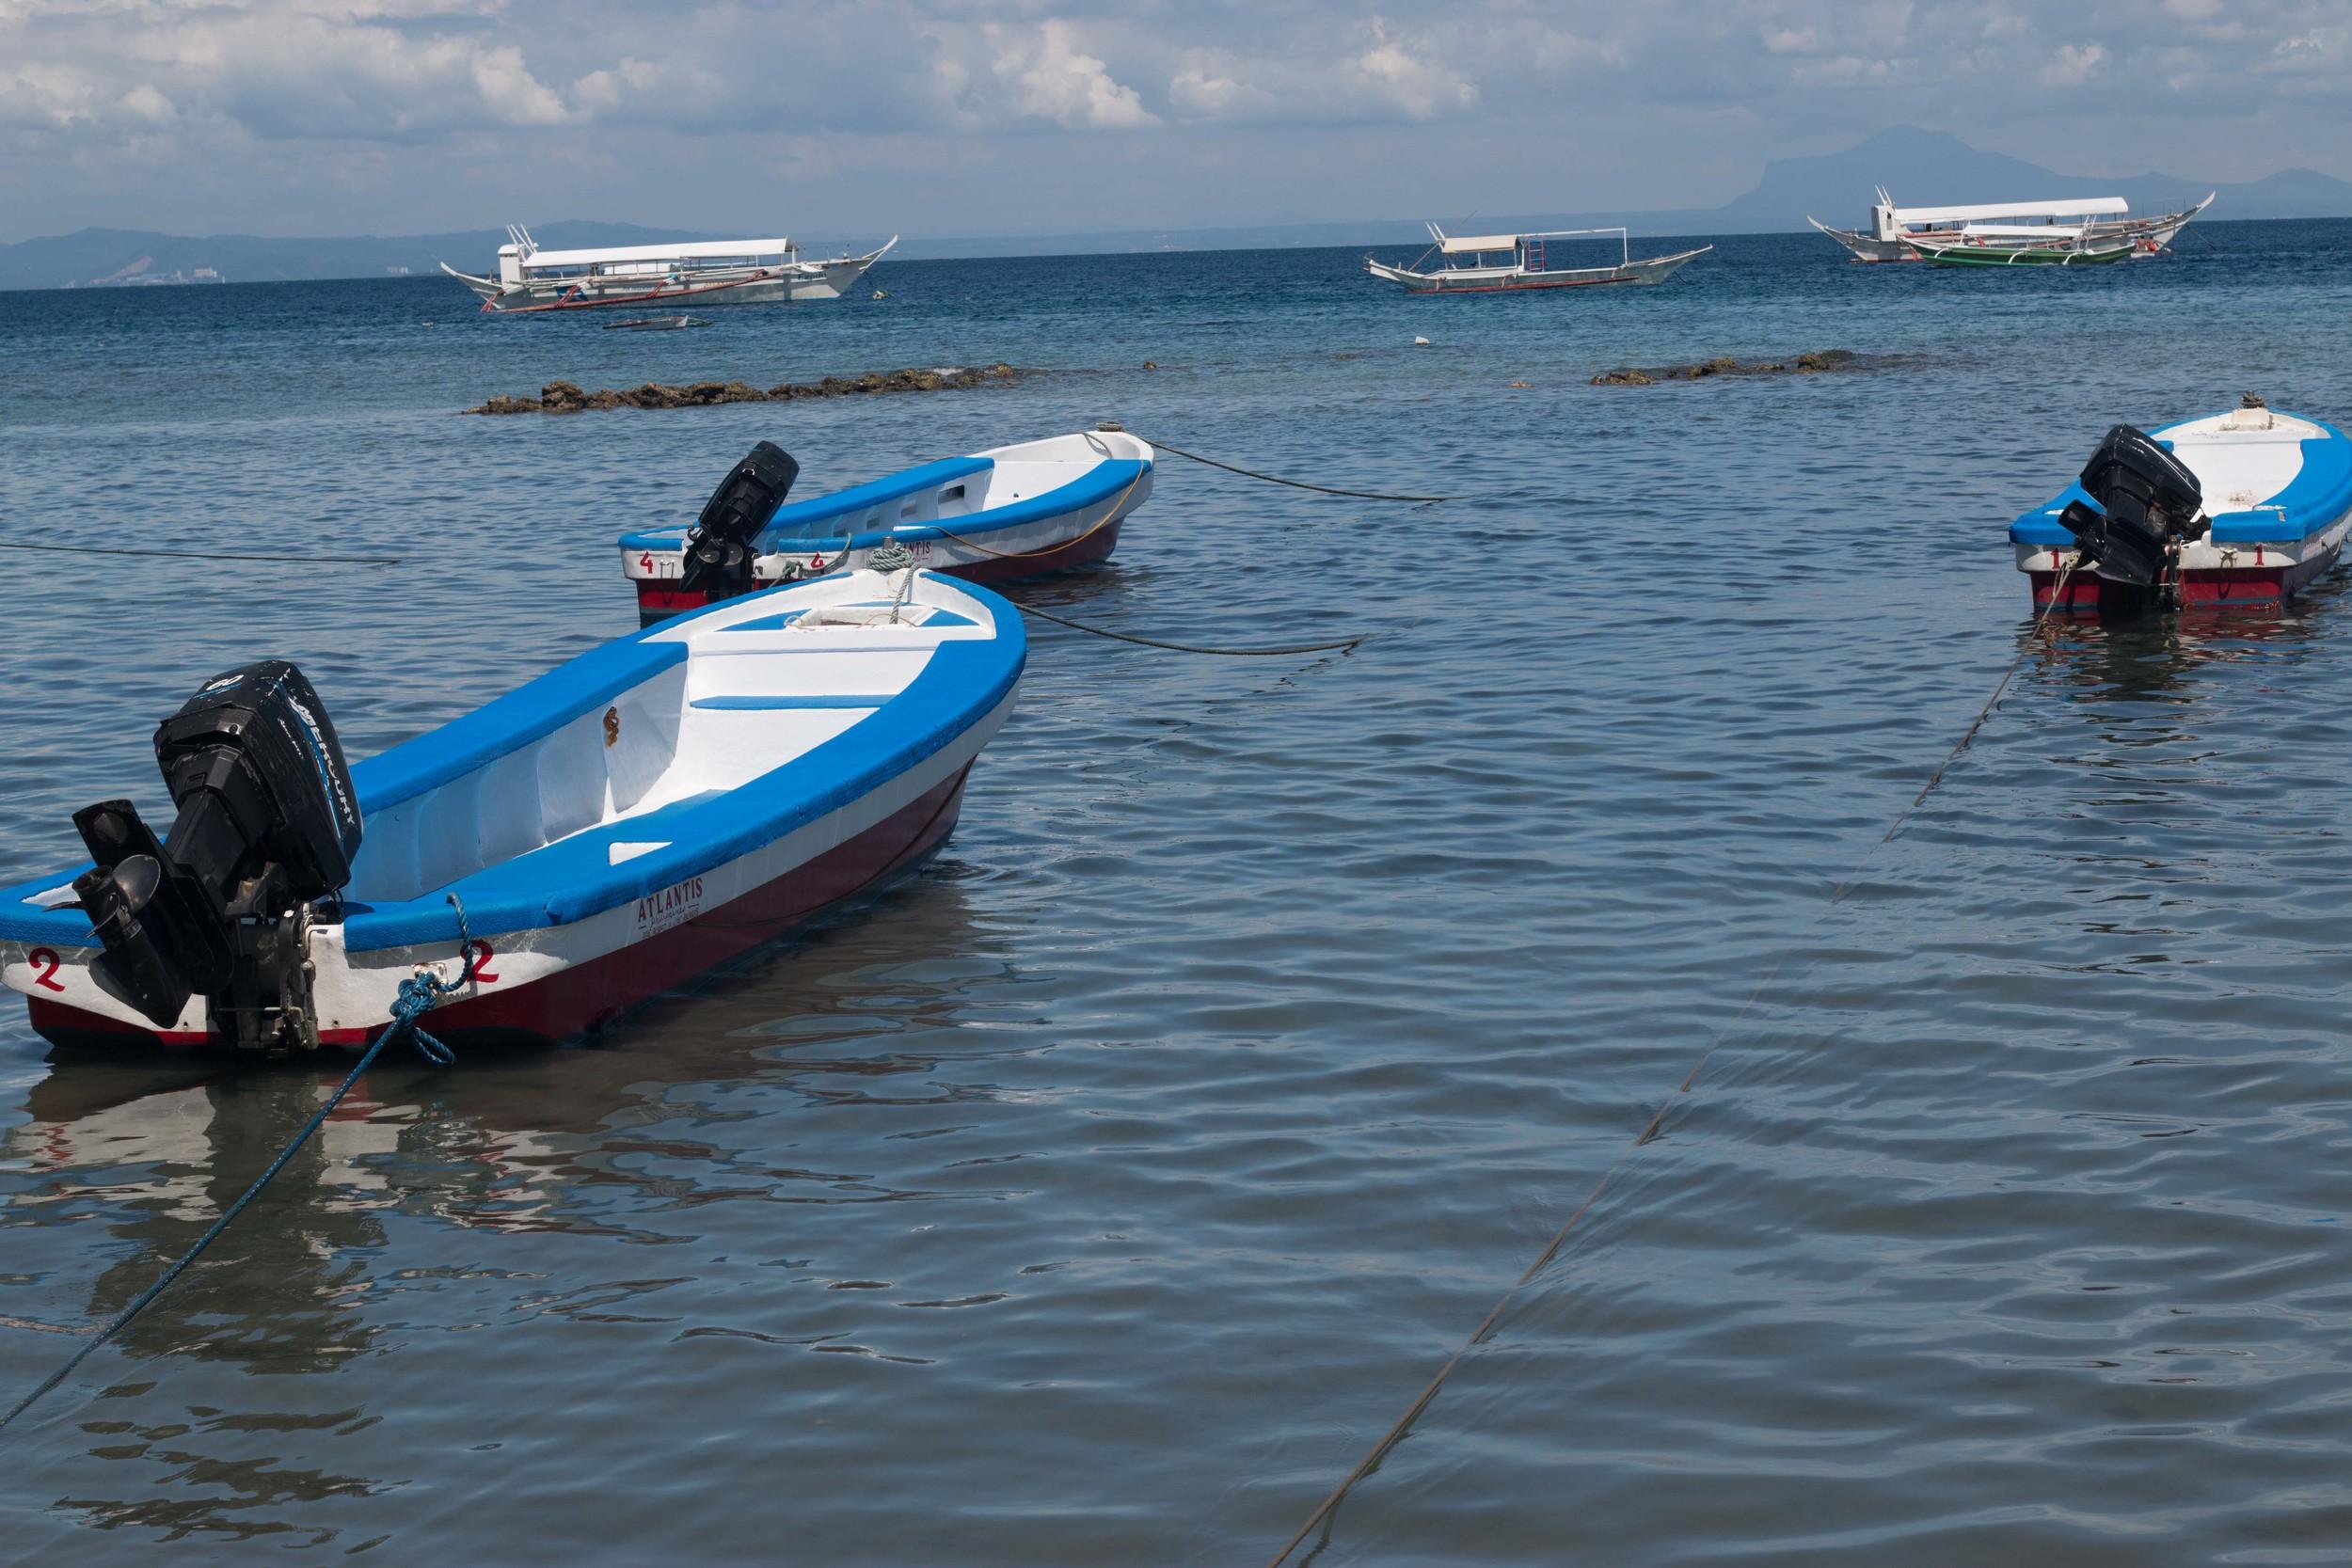 The Atlantis Fleet of Dive boats